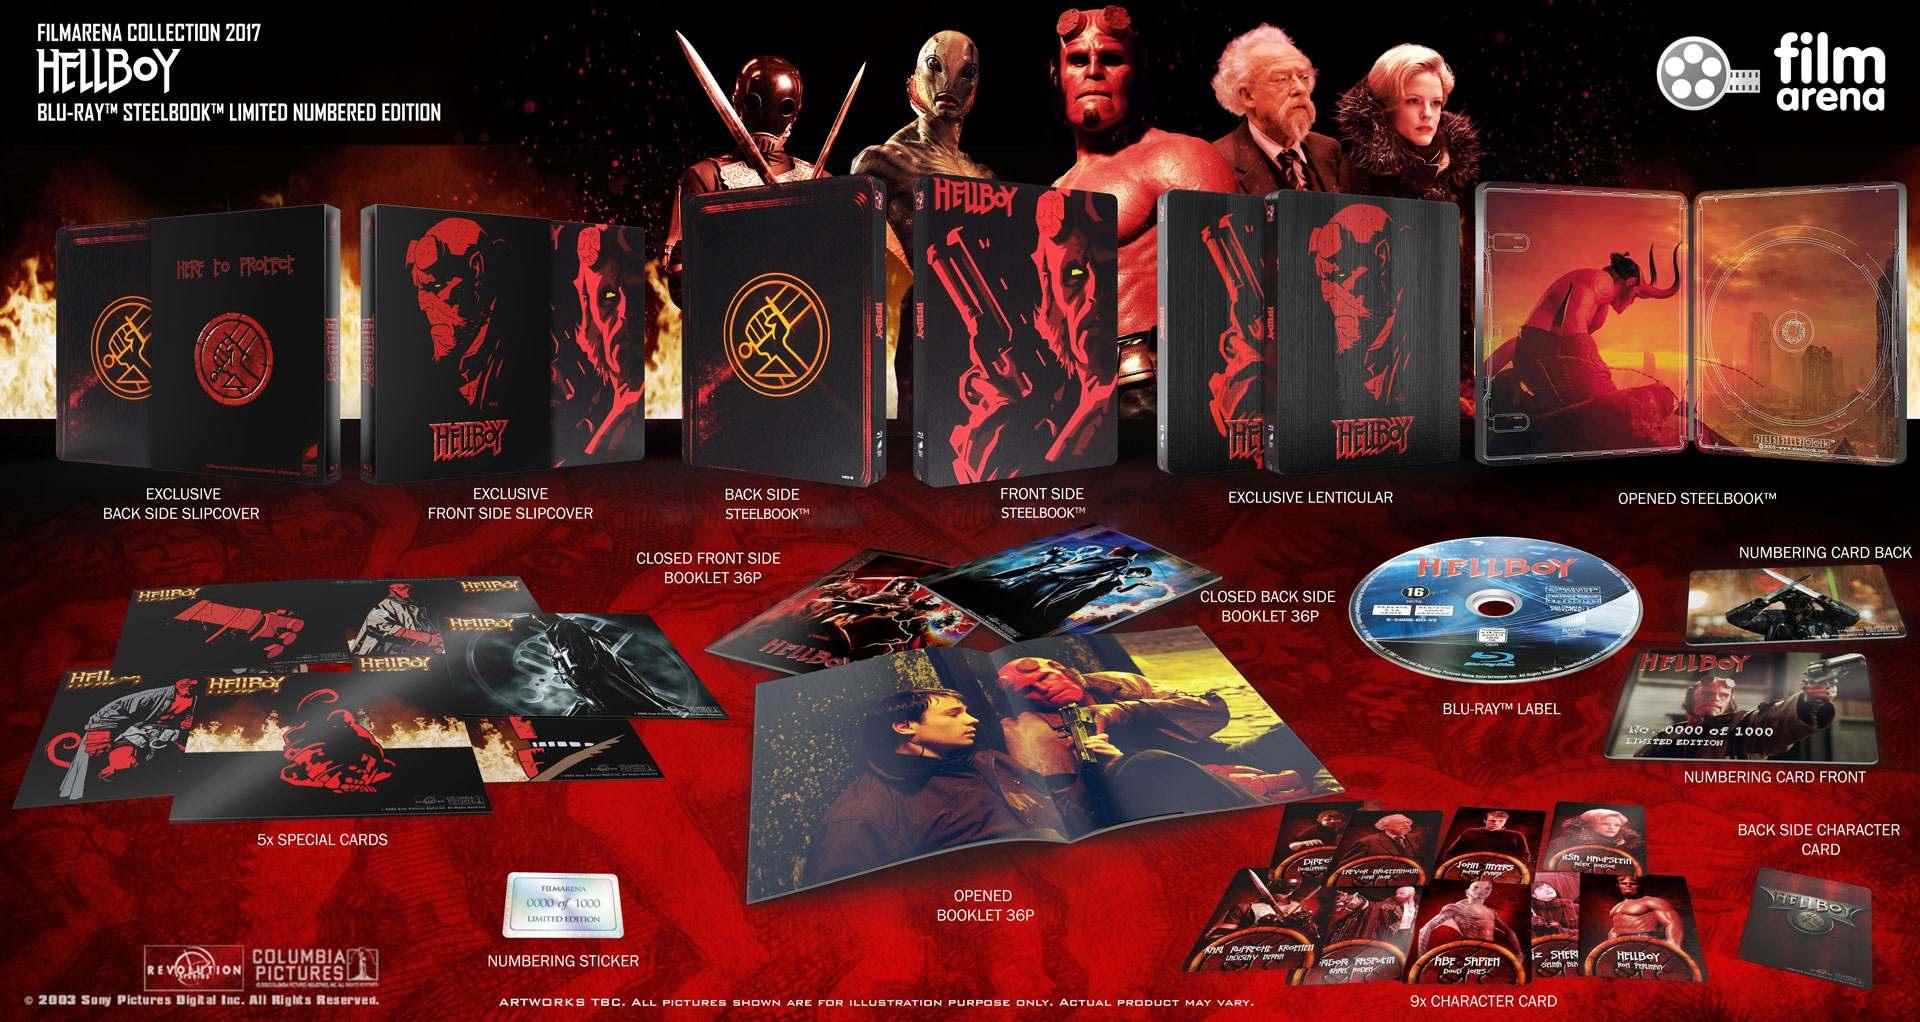 Hellboy steelbook filmarena 2